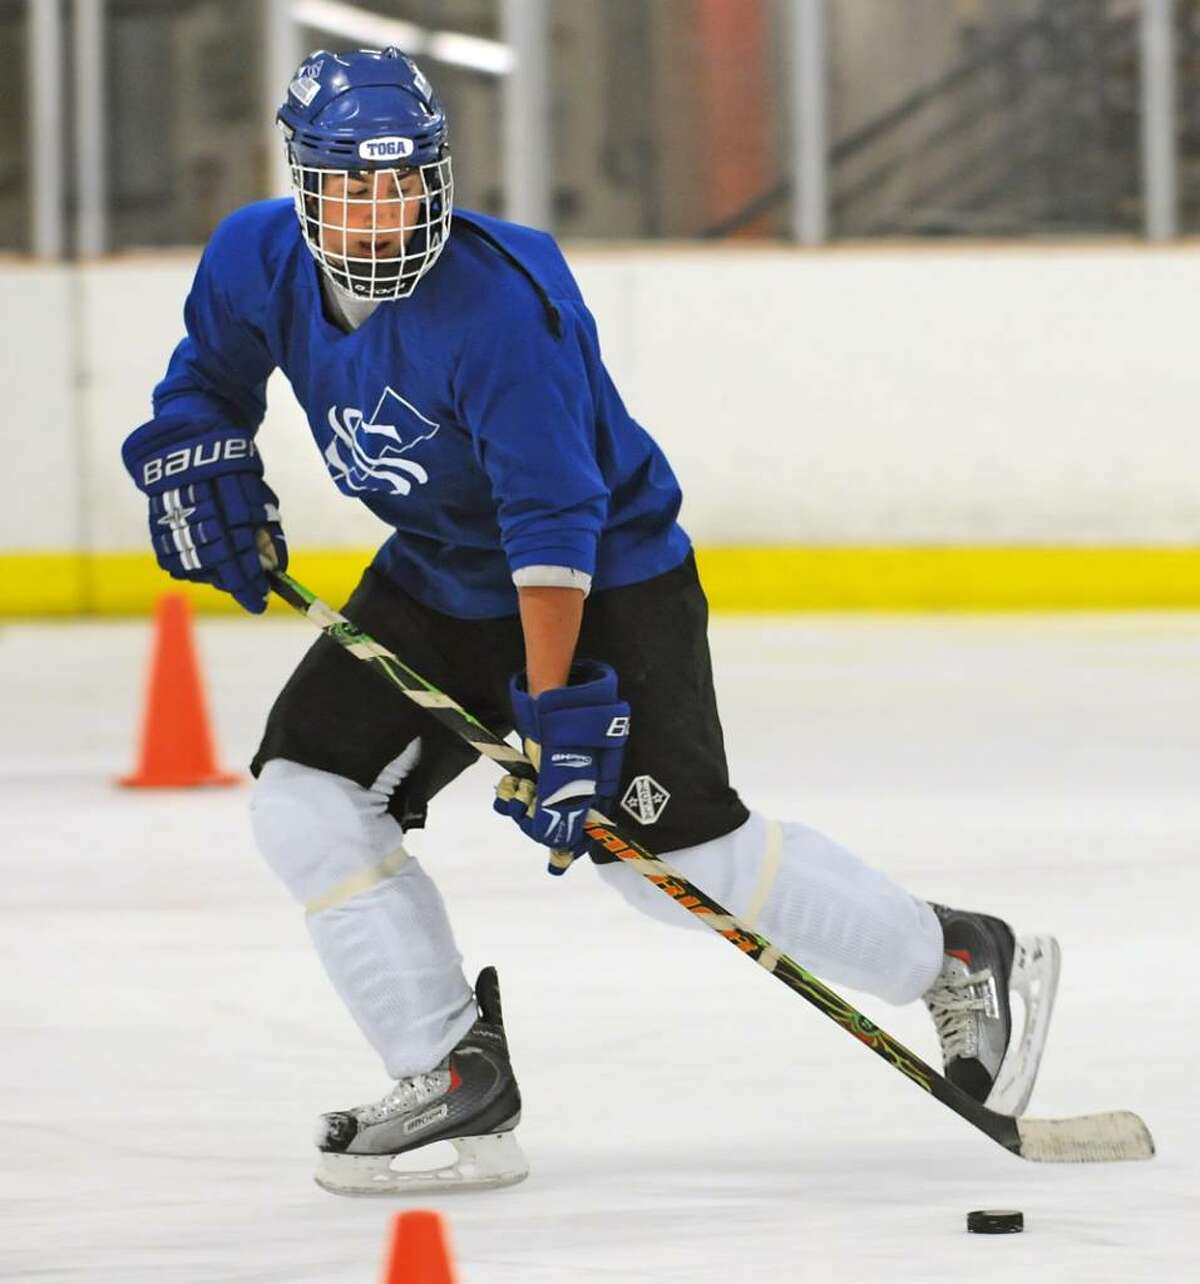 Saratoga Springs hockey player Cody Nizolek runs a drill during practice at the Streaks' home rink. (Lori Van Buren / Times Union)